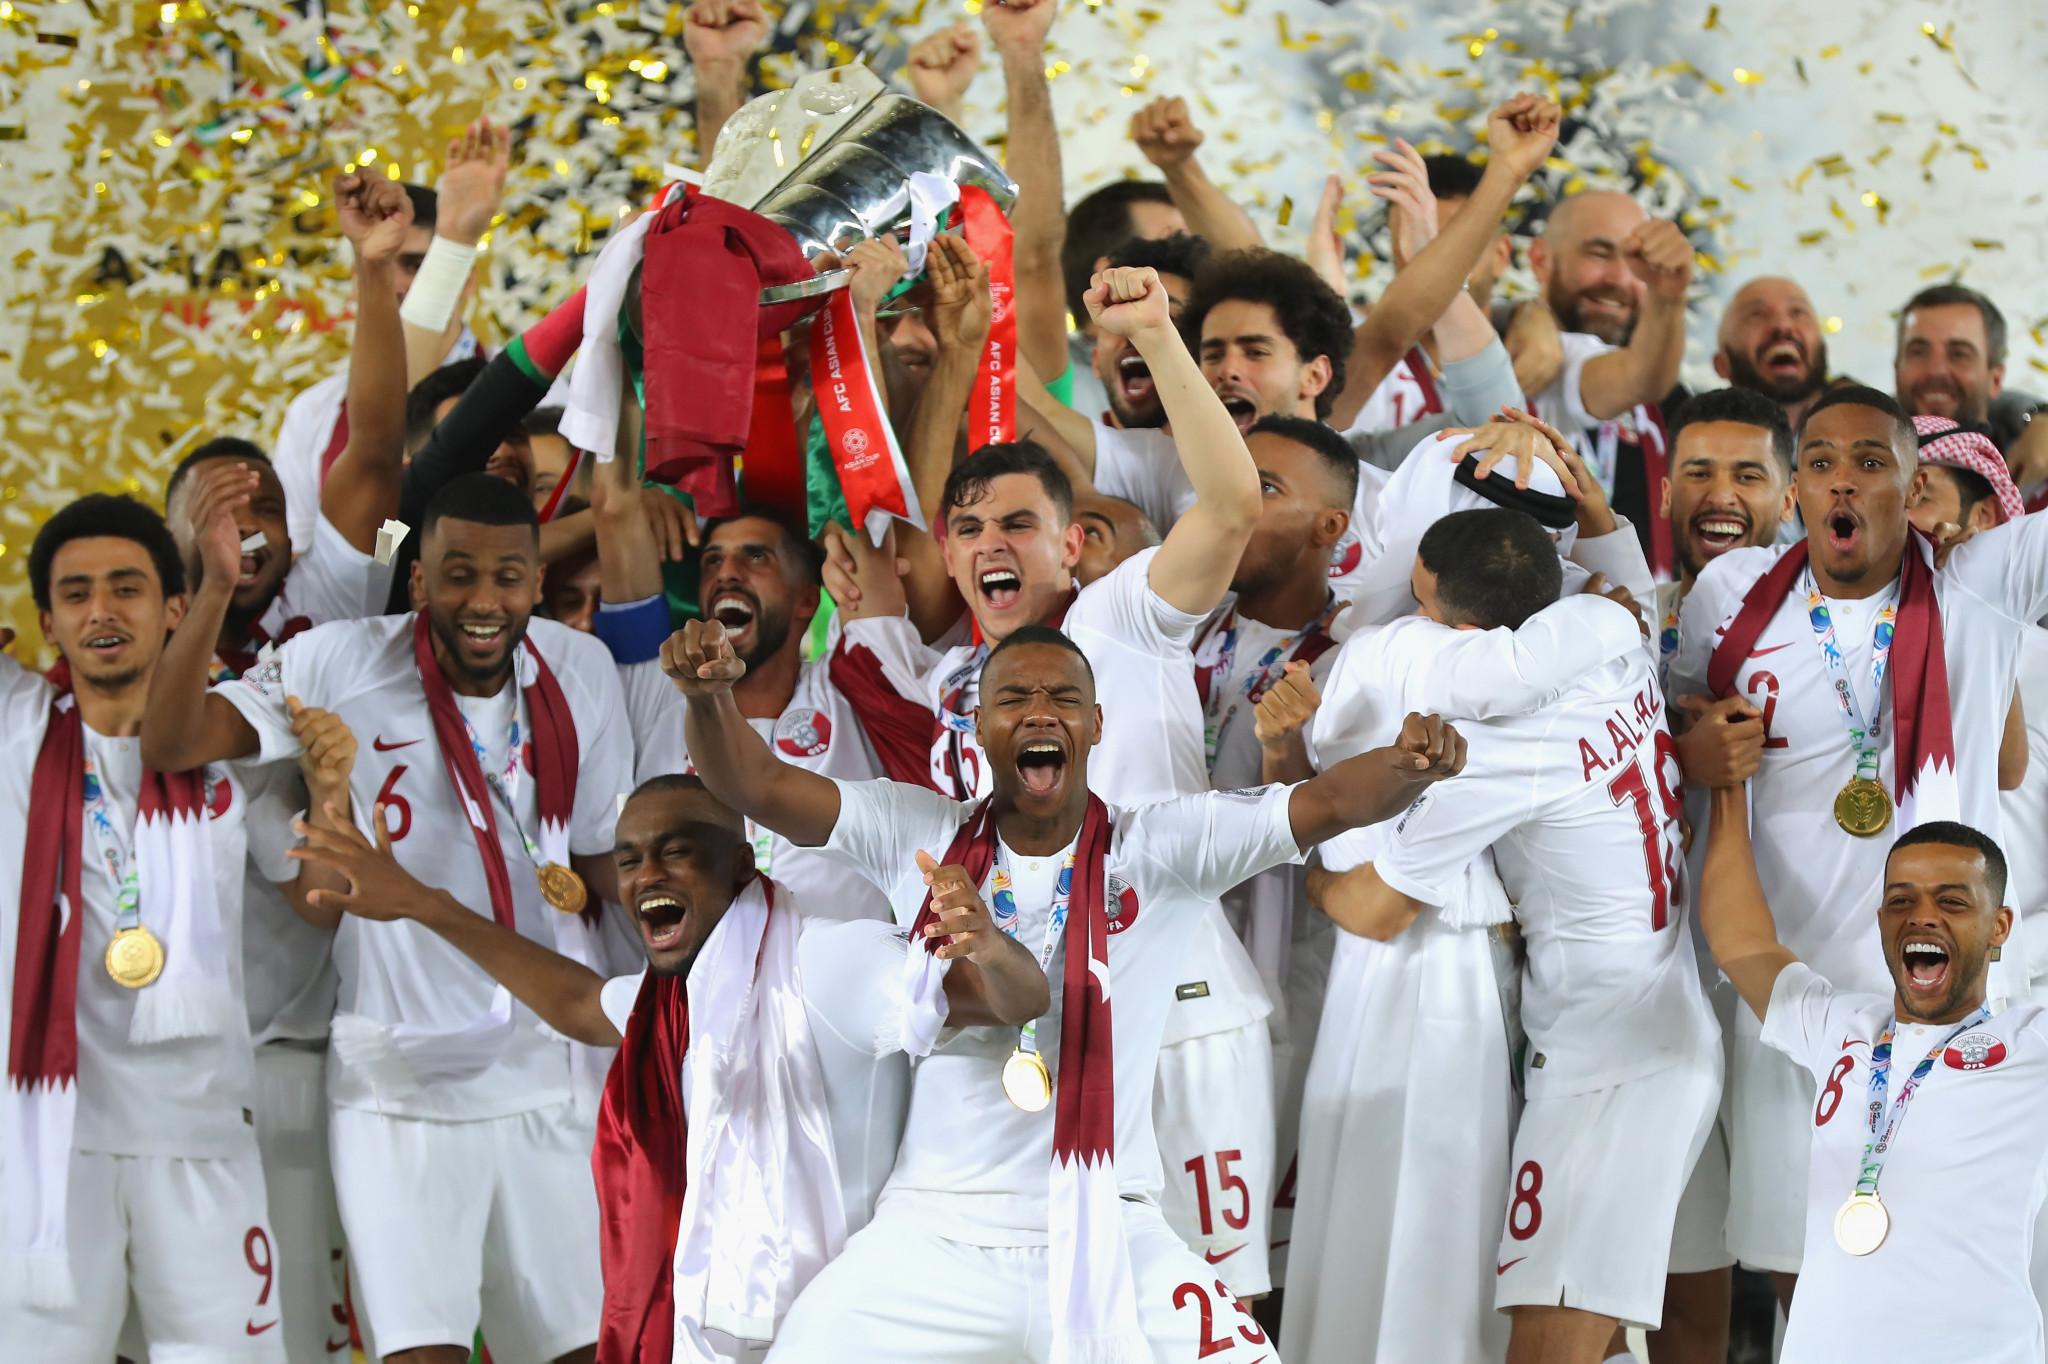 Qatar to play in mock European qualifiers ahead of 2022 FIFA World Cup